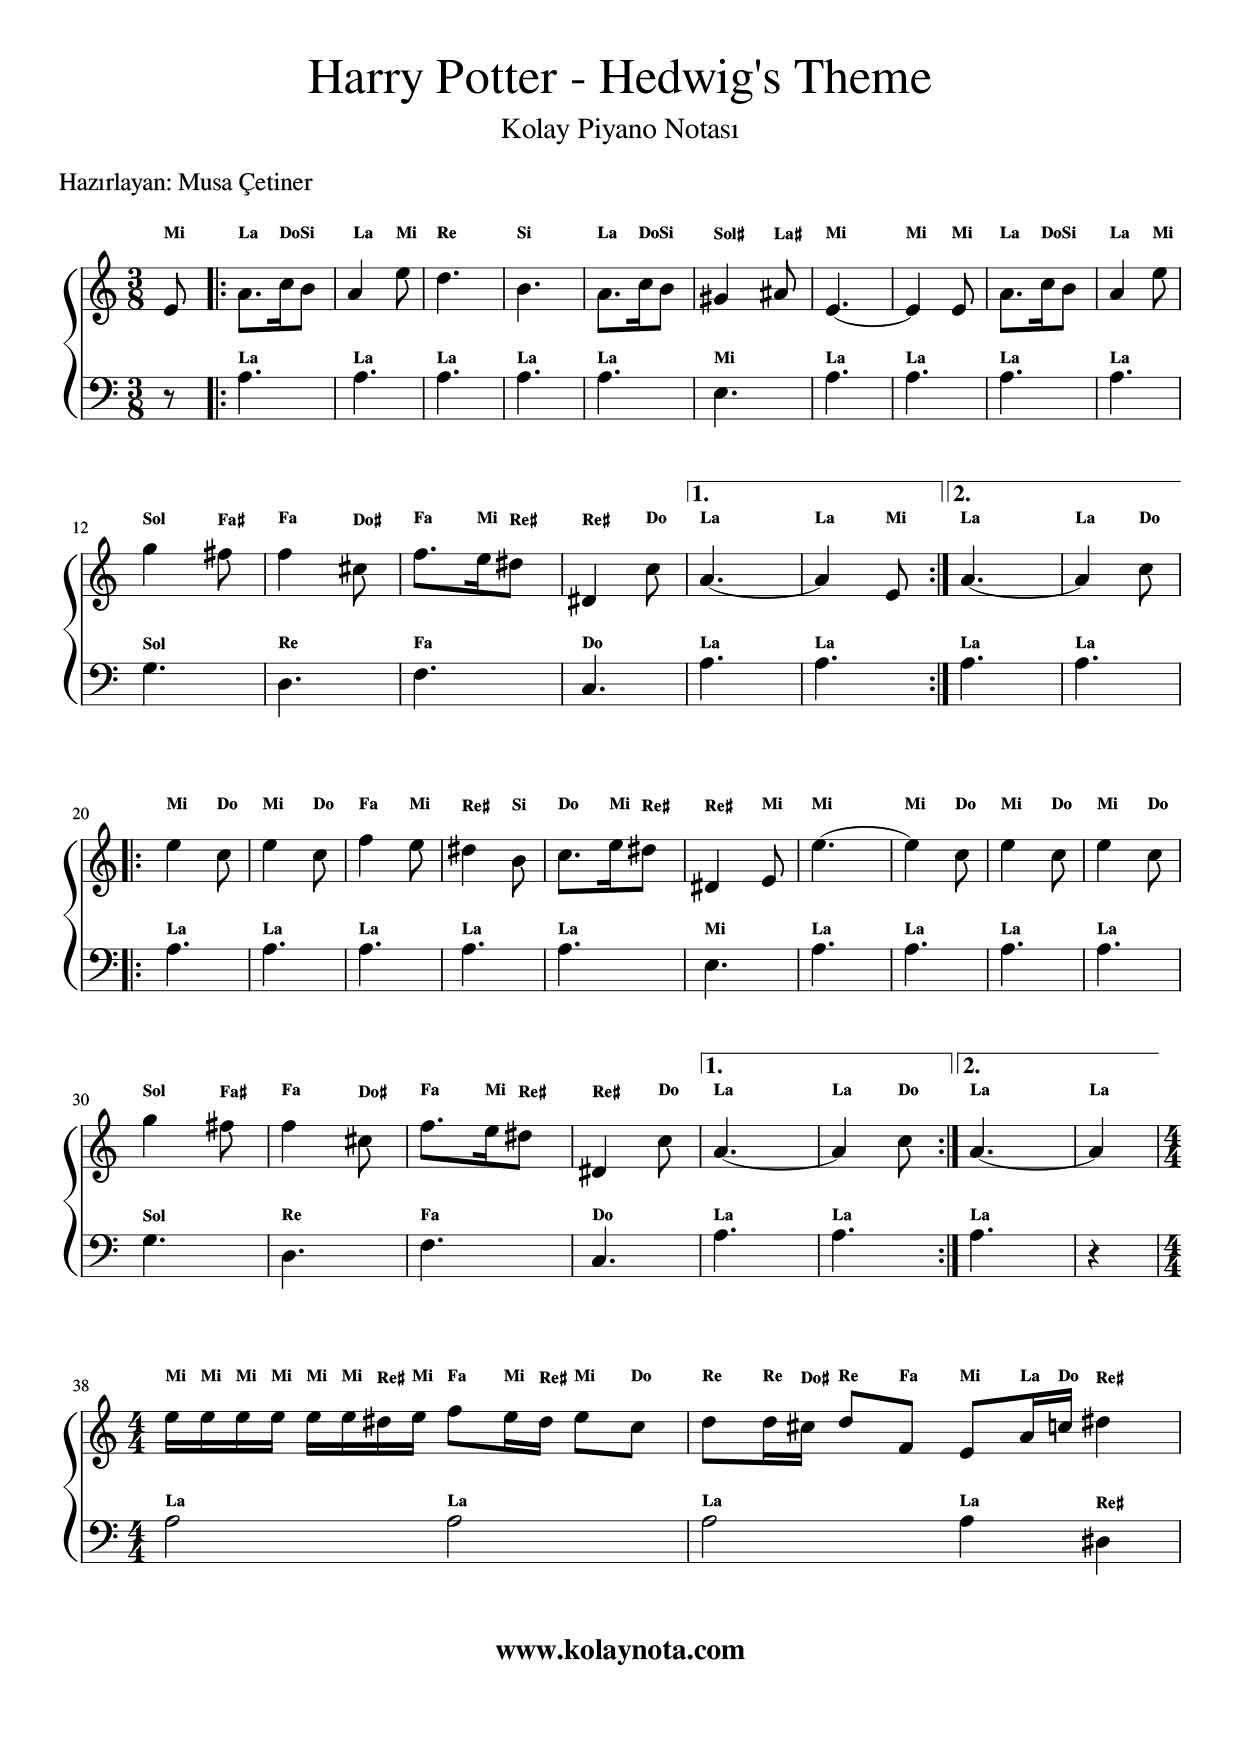 Harry Potter Hedwig S Theme Kolay Piyano Notasi Kolaynota Com Nota Arsivi Pi Yano Harry Potter Muzik Notalari